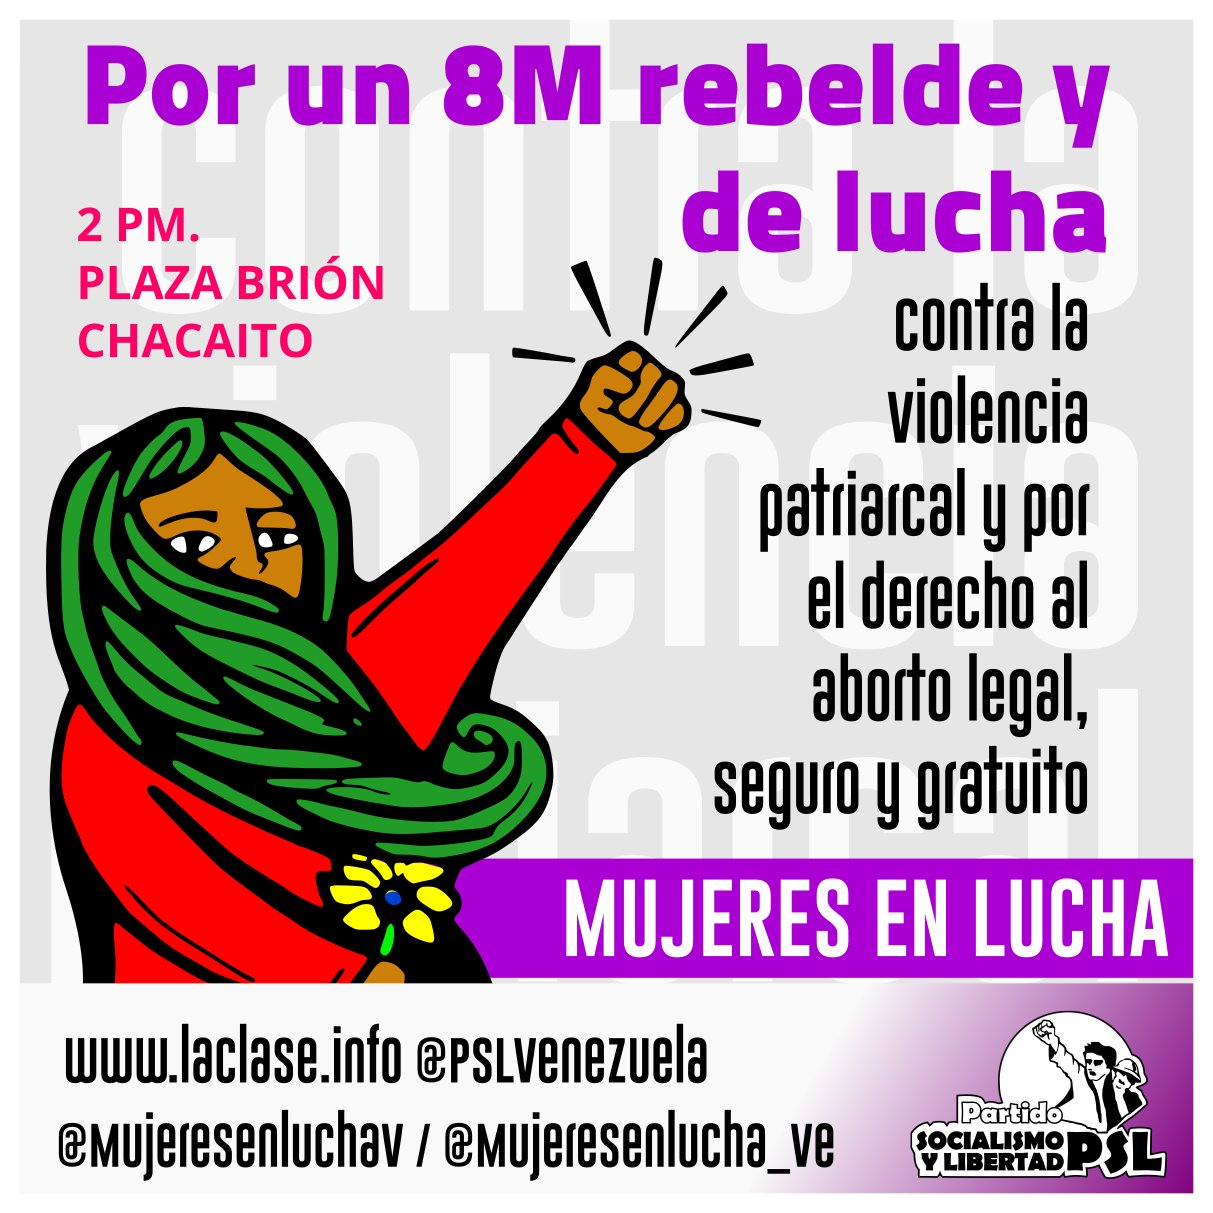 @MujeresenluchaV